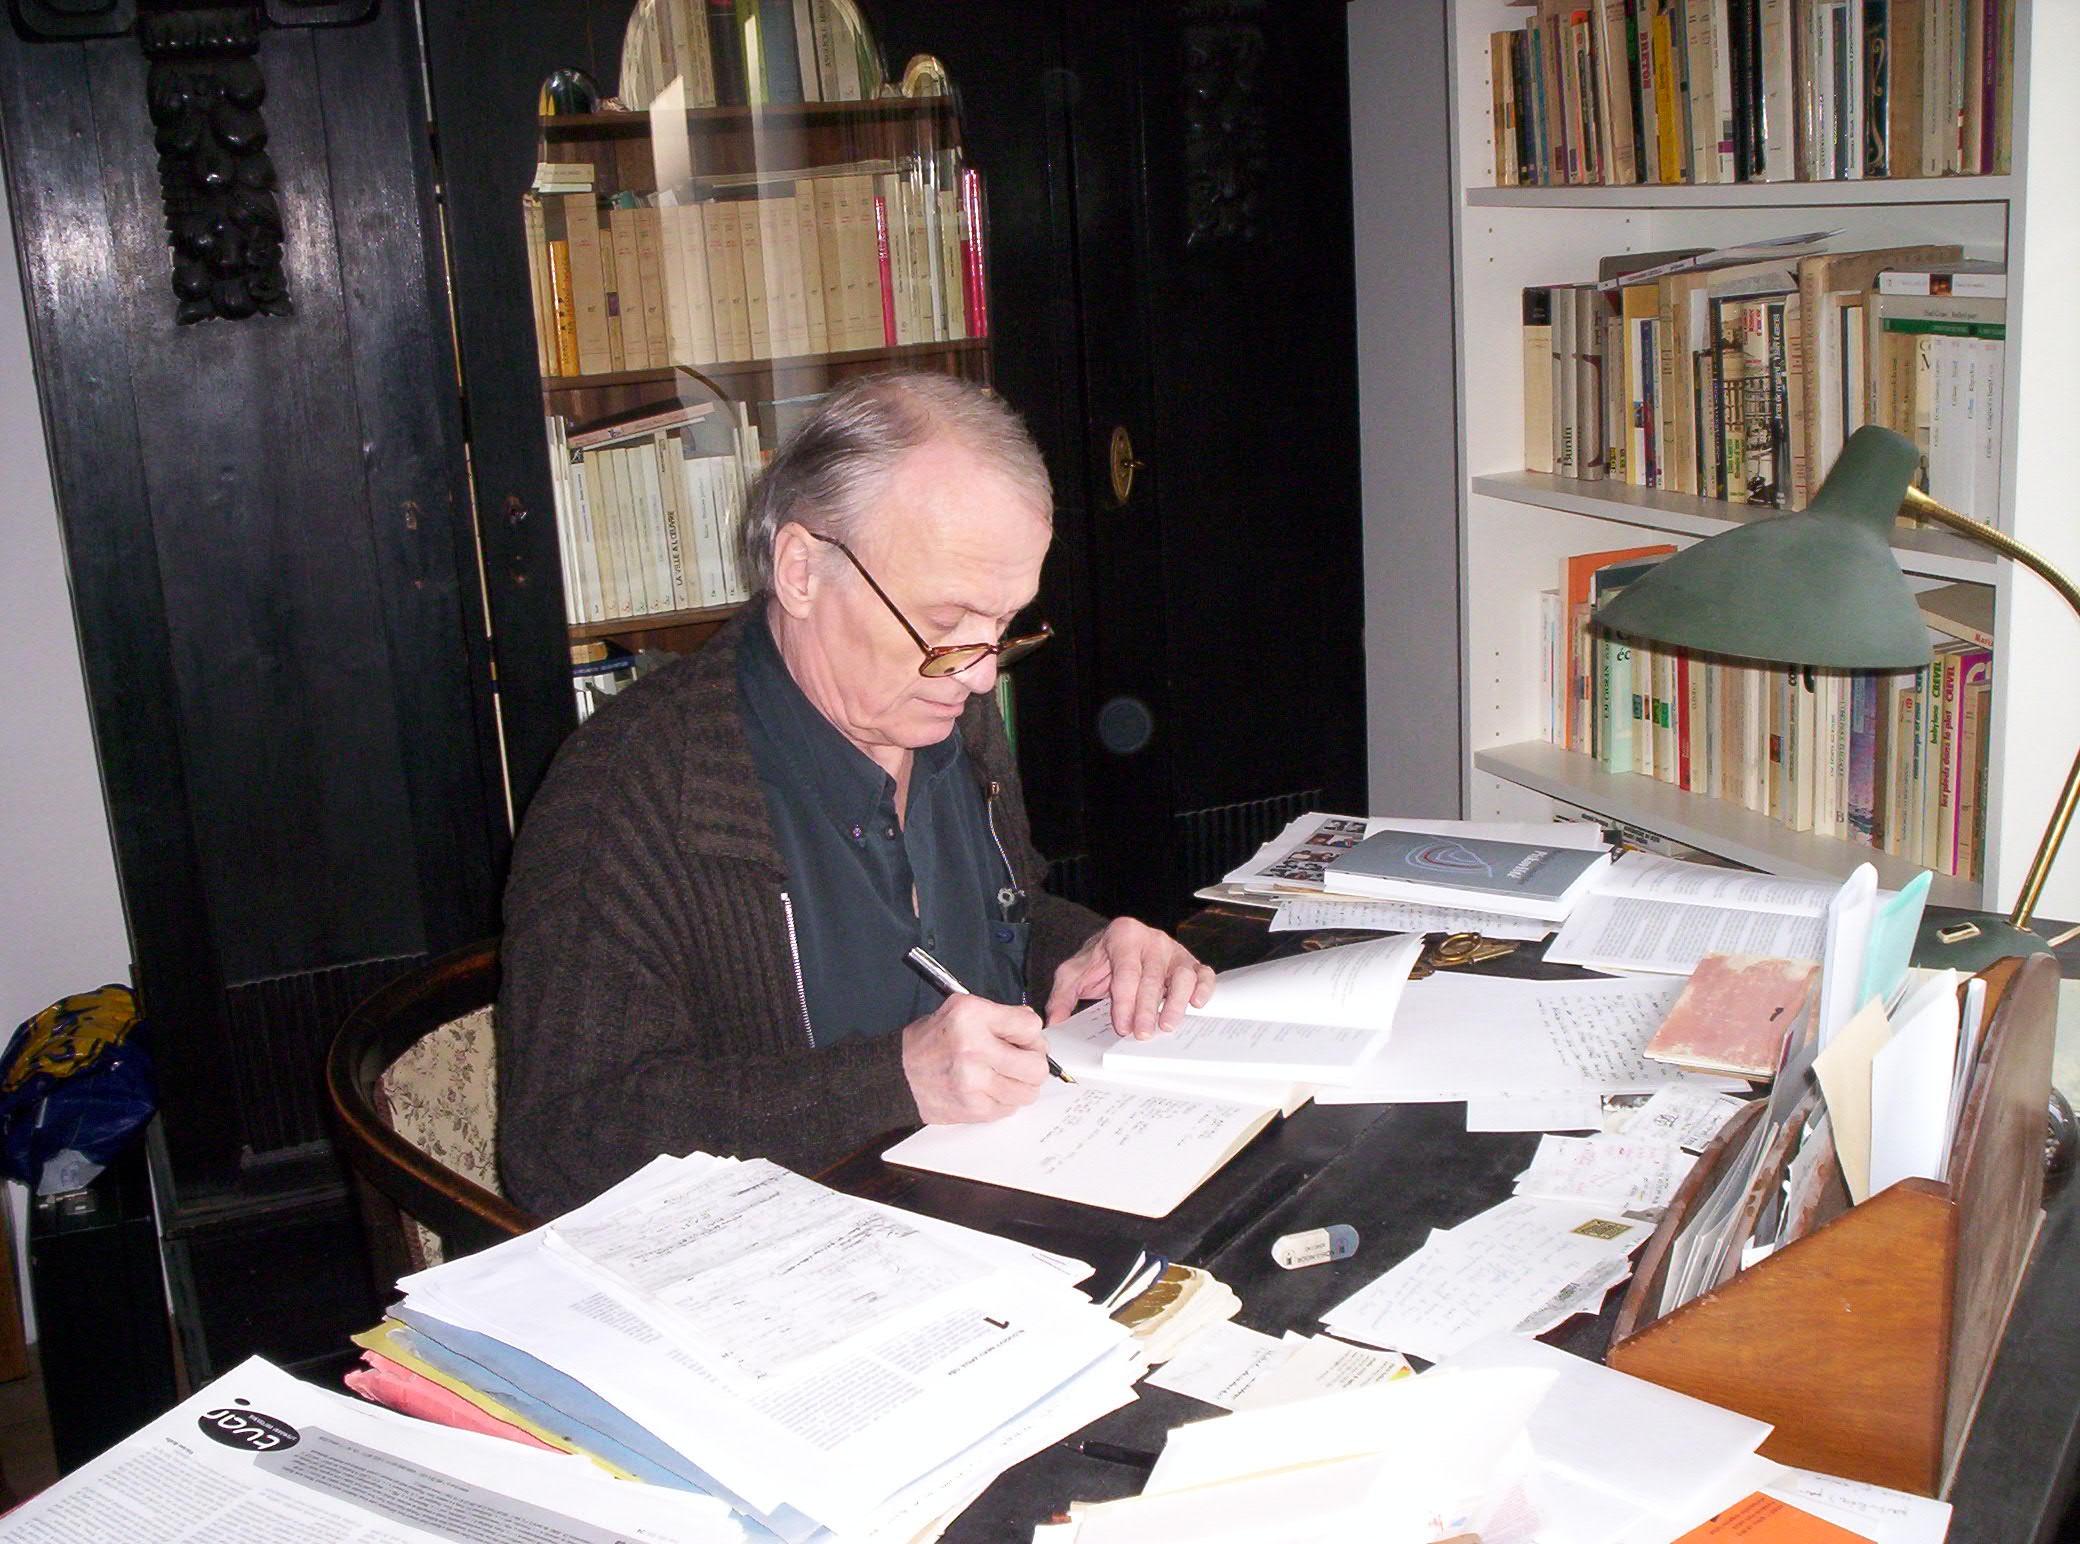 Petr Král in his study, 2008